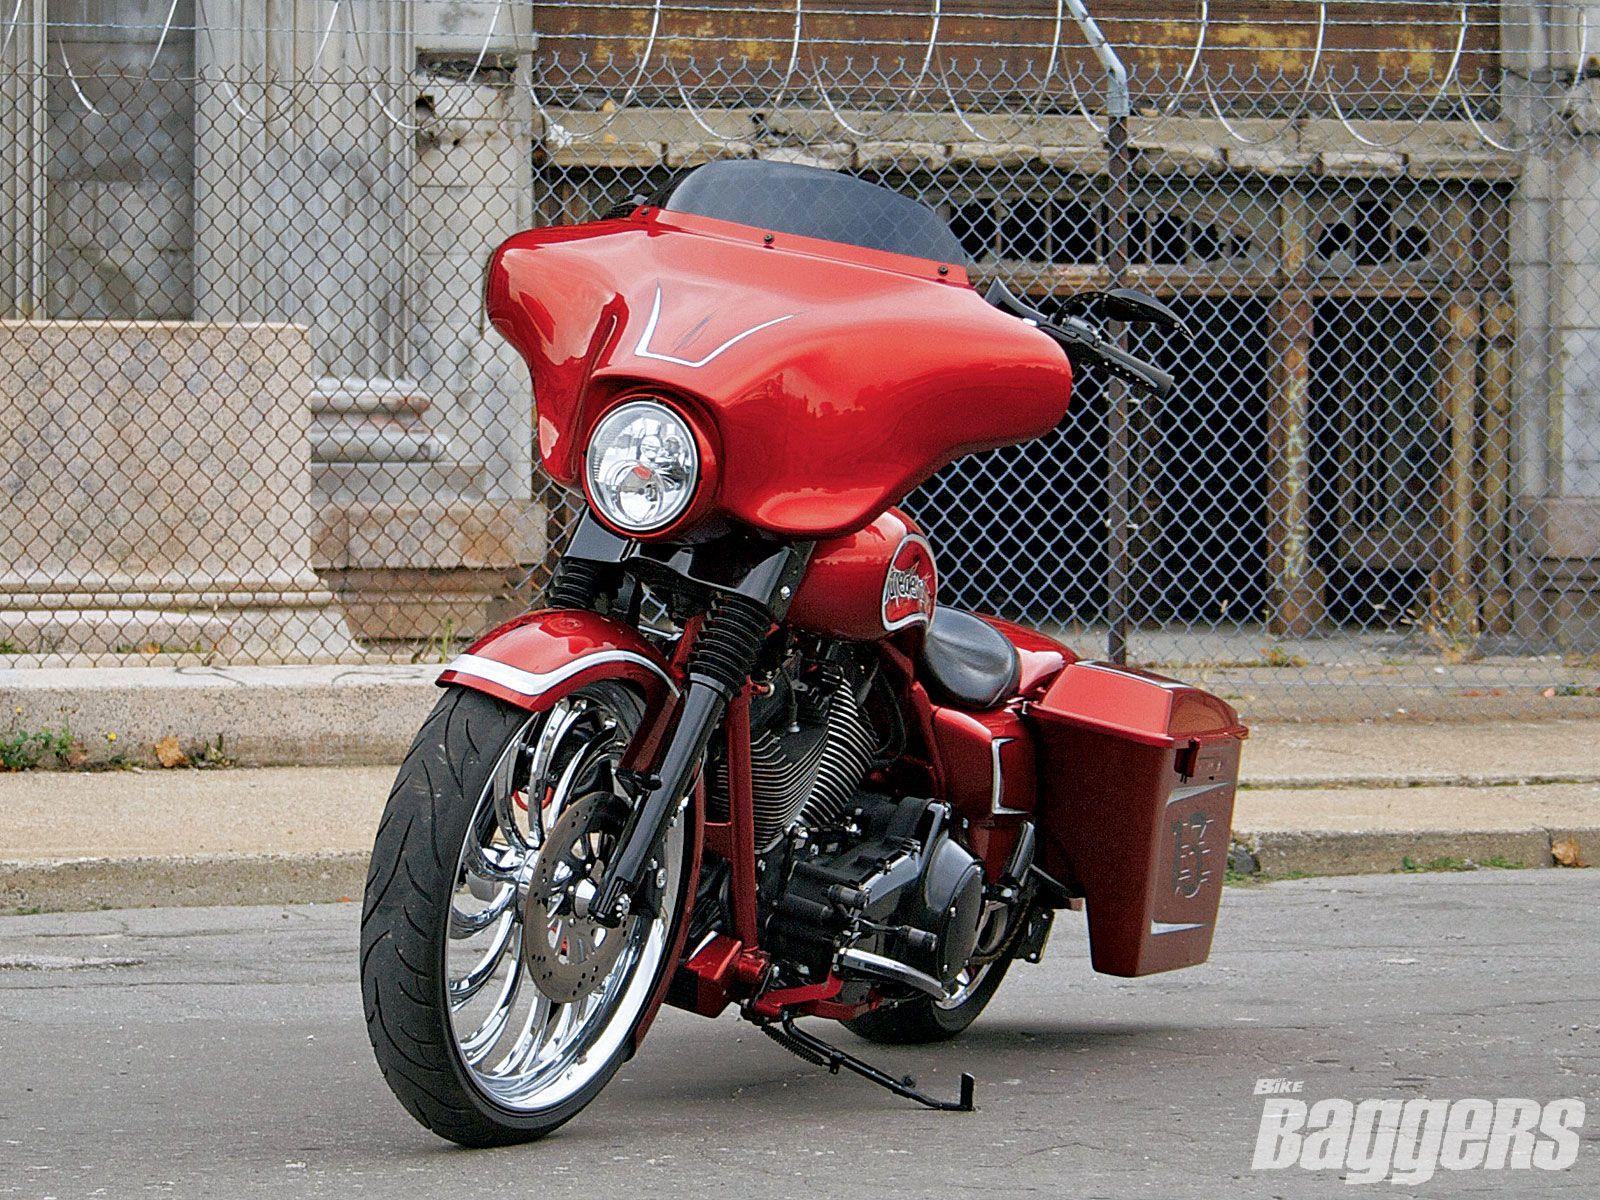 Daredevil choppers 2009 harley davidson flhx street glide baggers